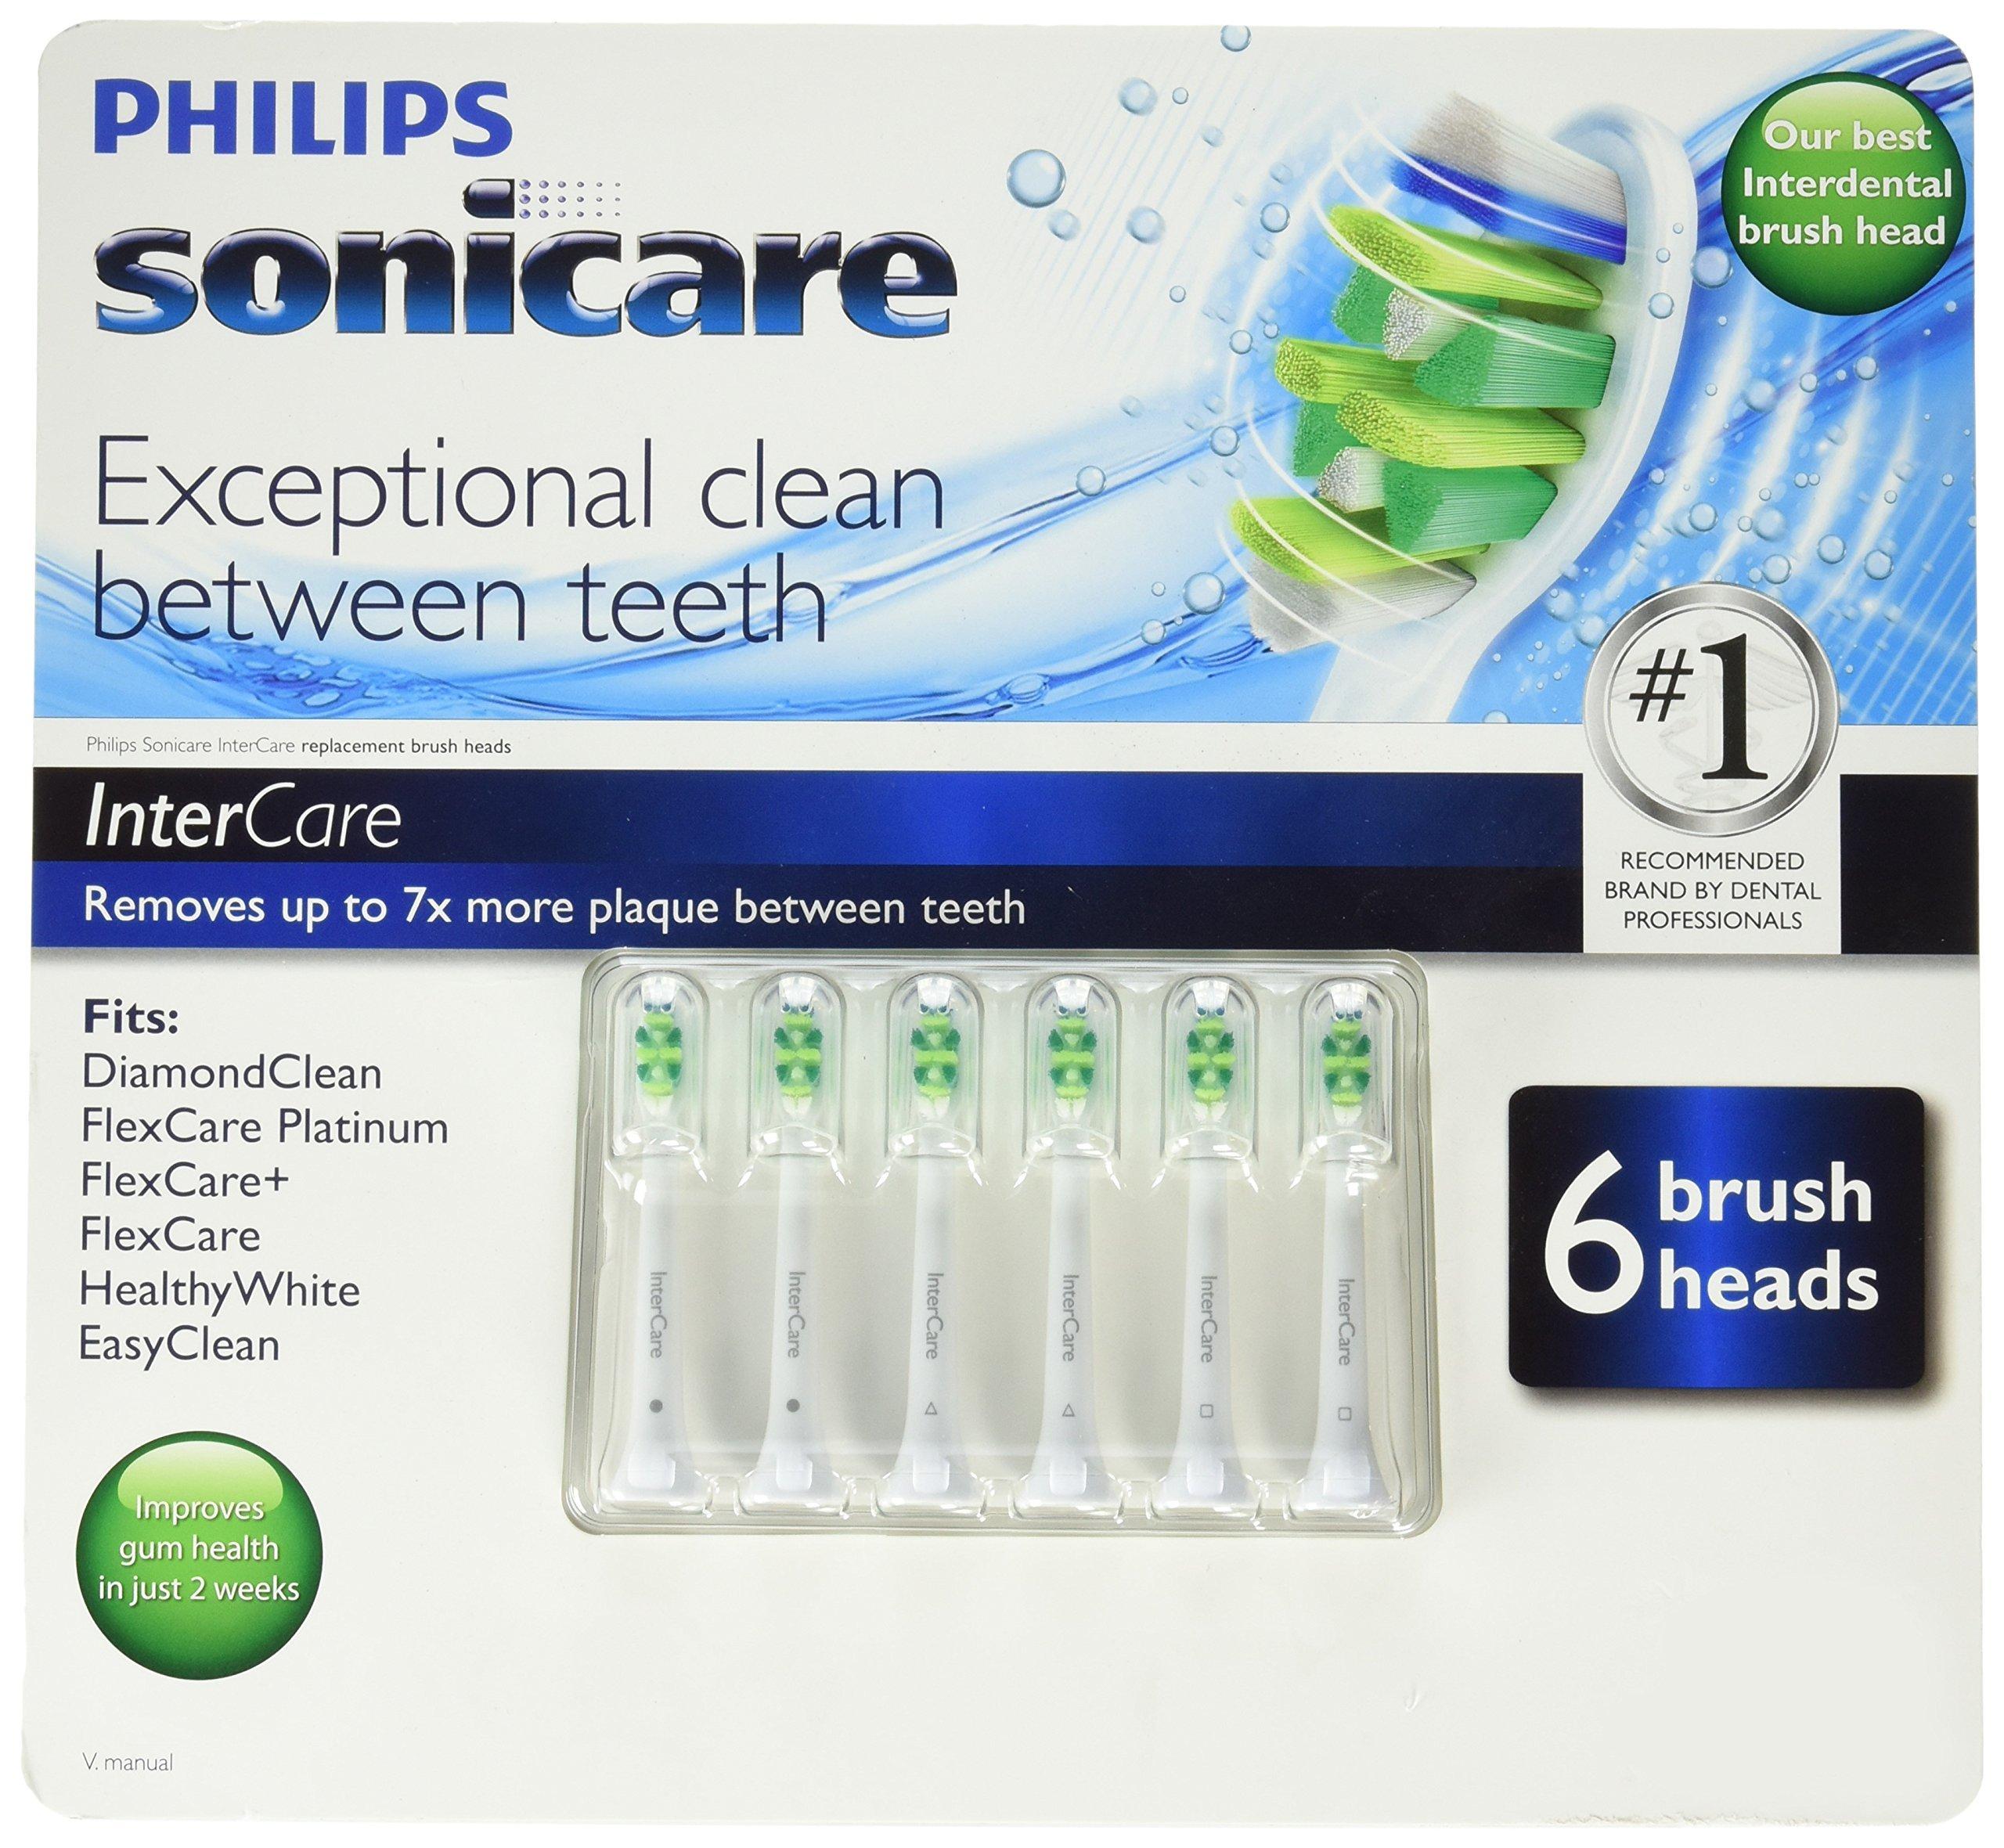 Philips Sonicare 1180 Intercare Brush Head, 6 Count